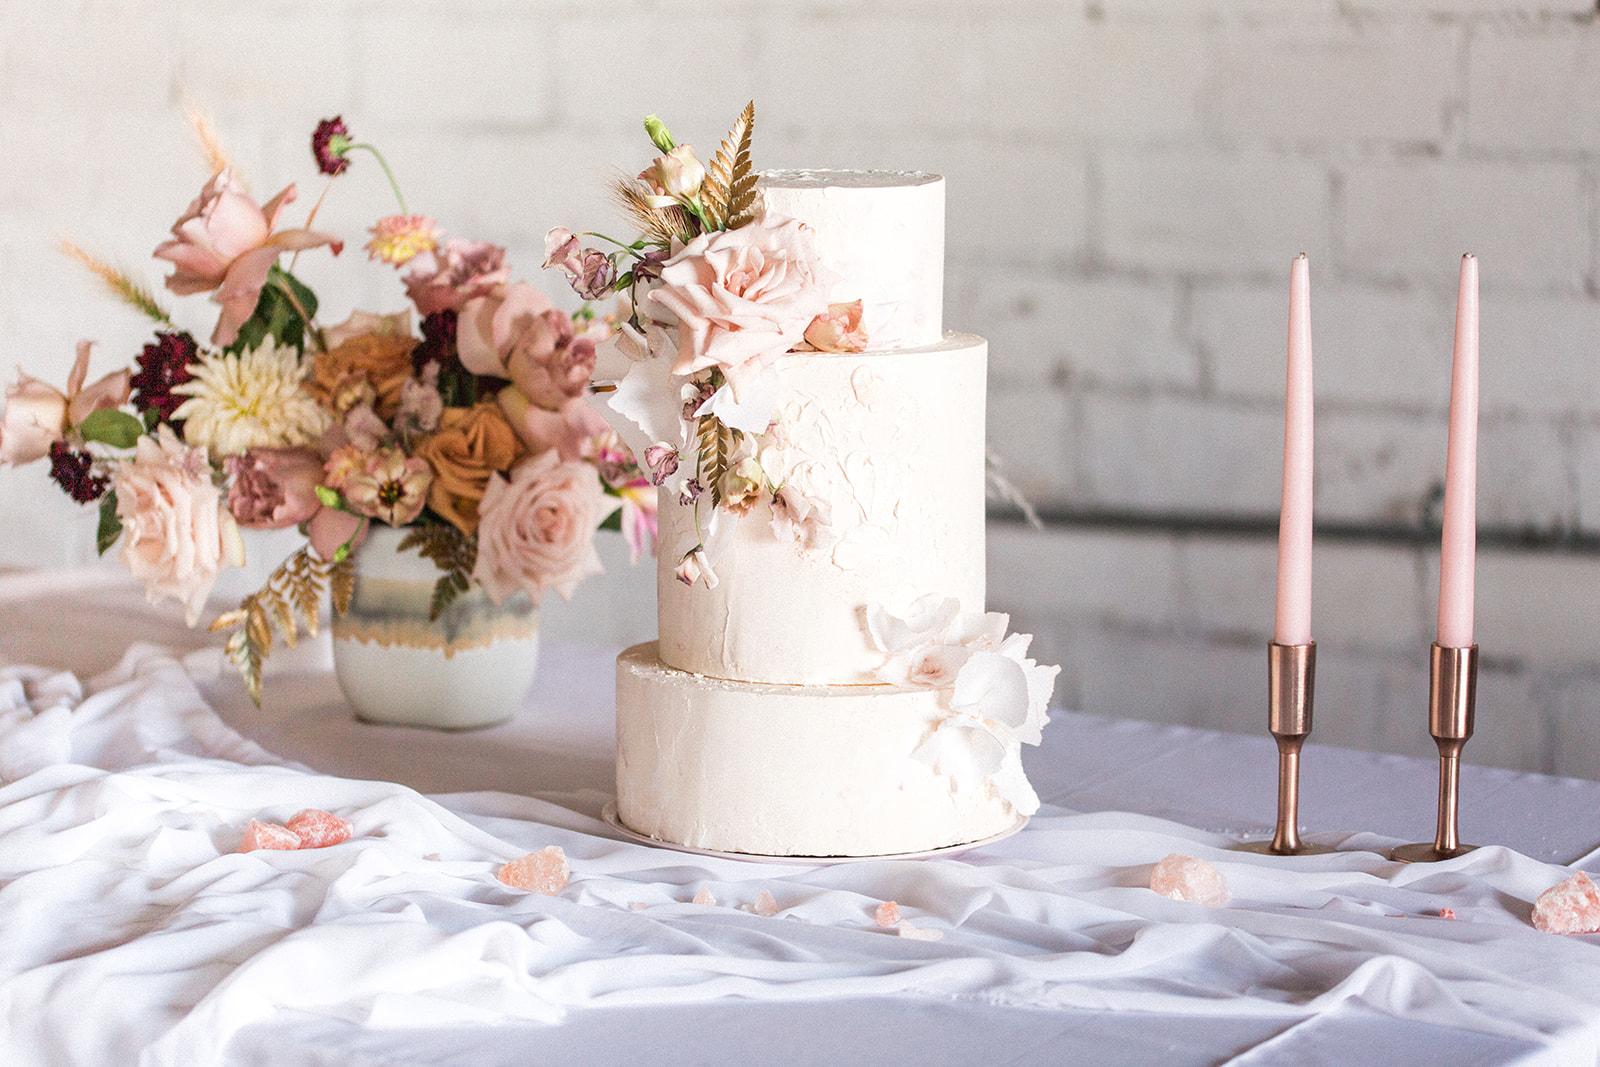 Fine art wedding cake design: Fall Garden Wedding featured on Alexa Kay Events